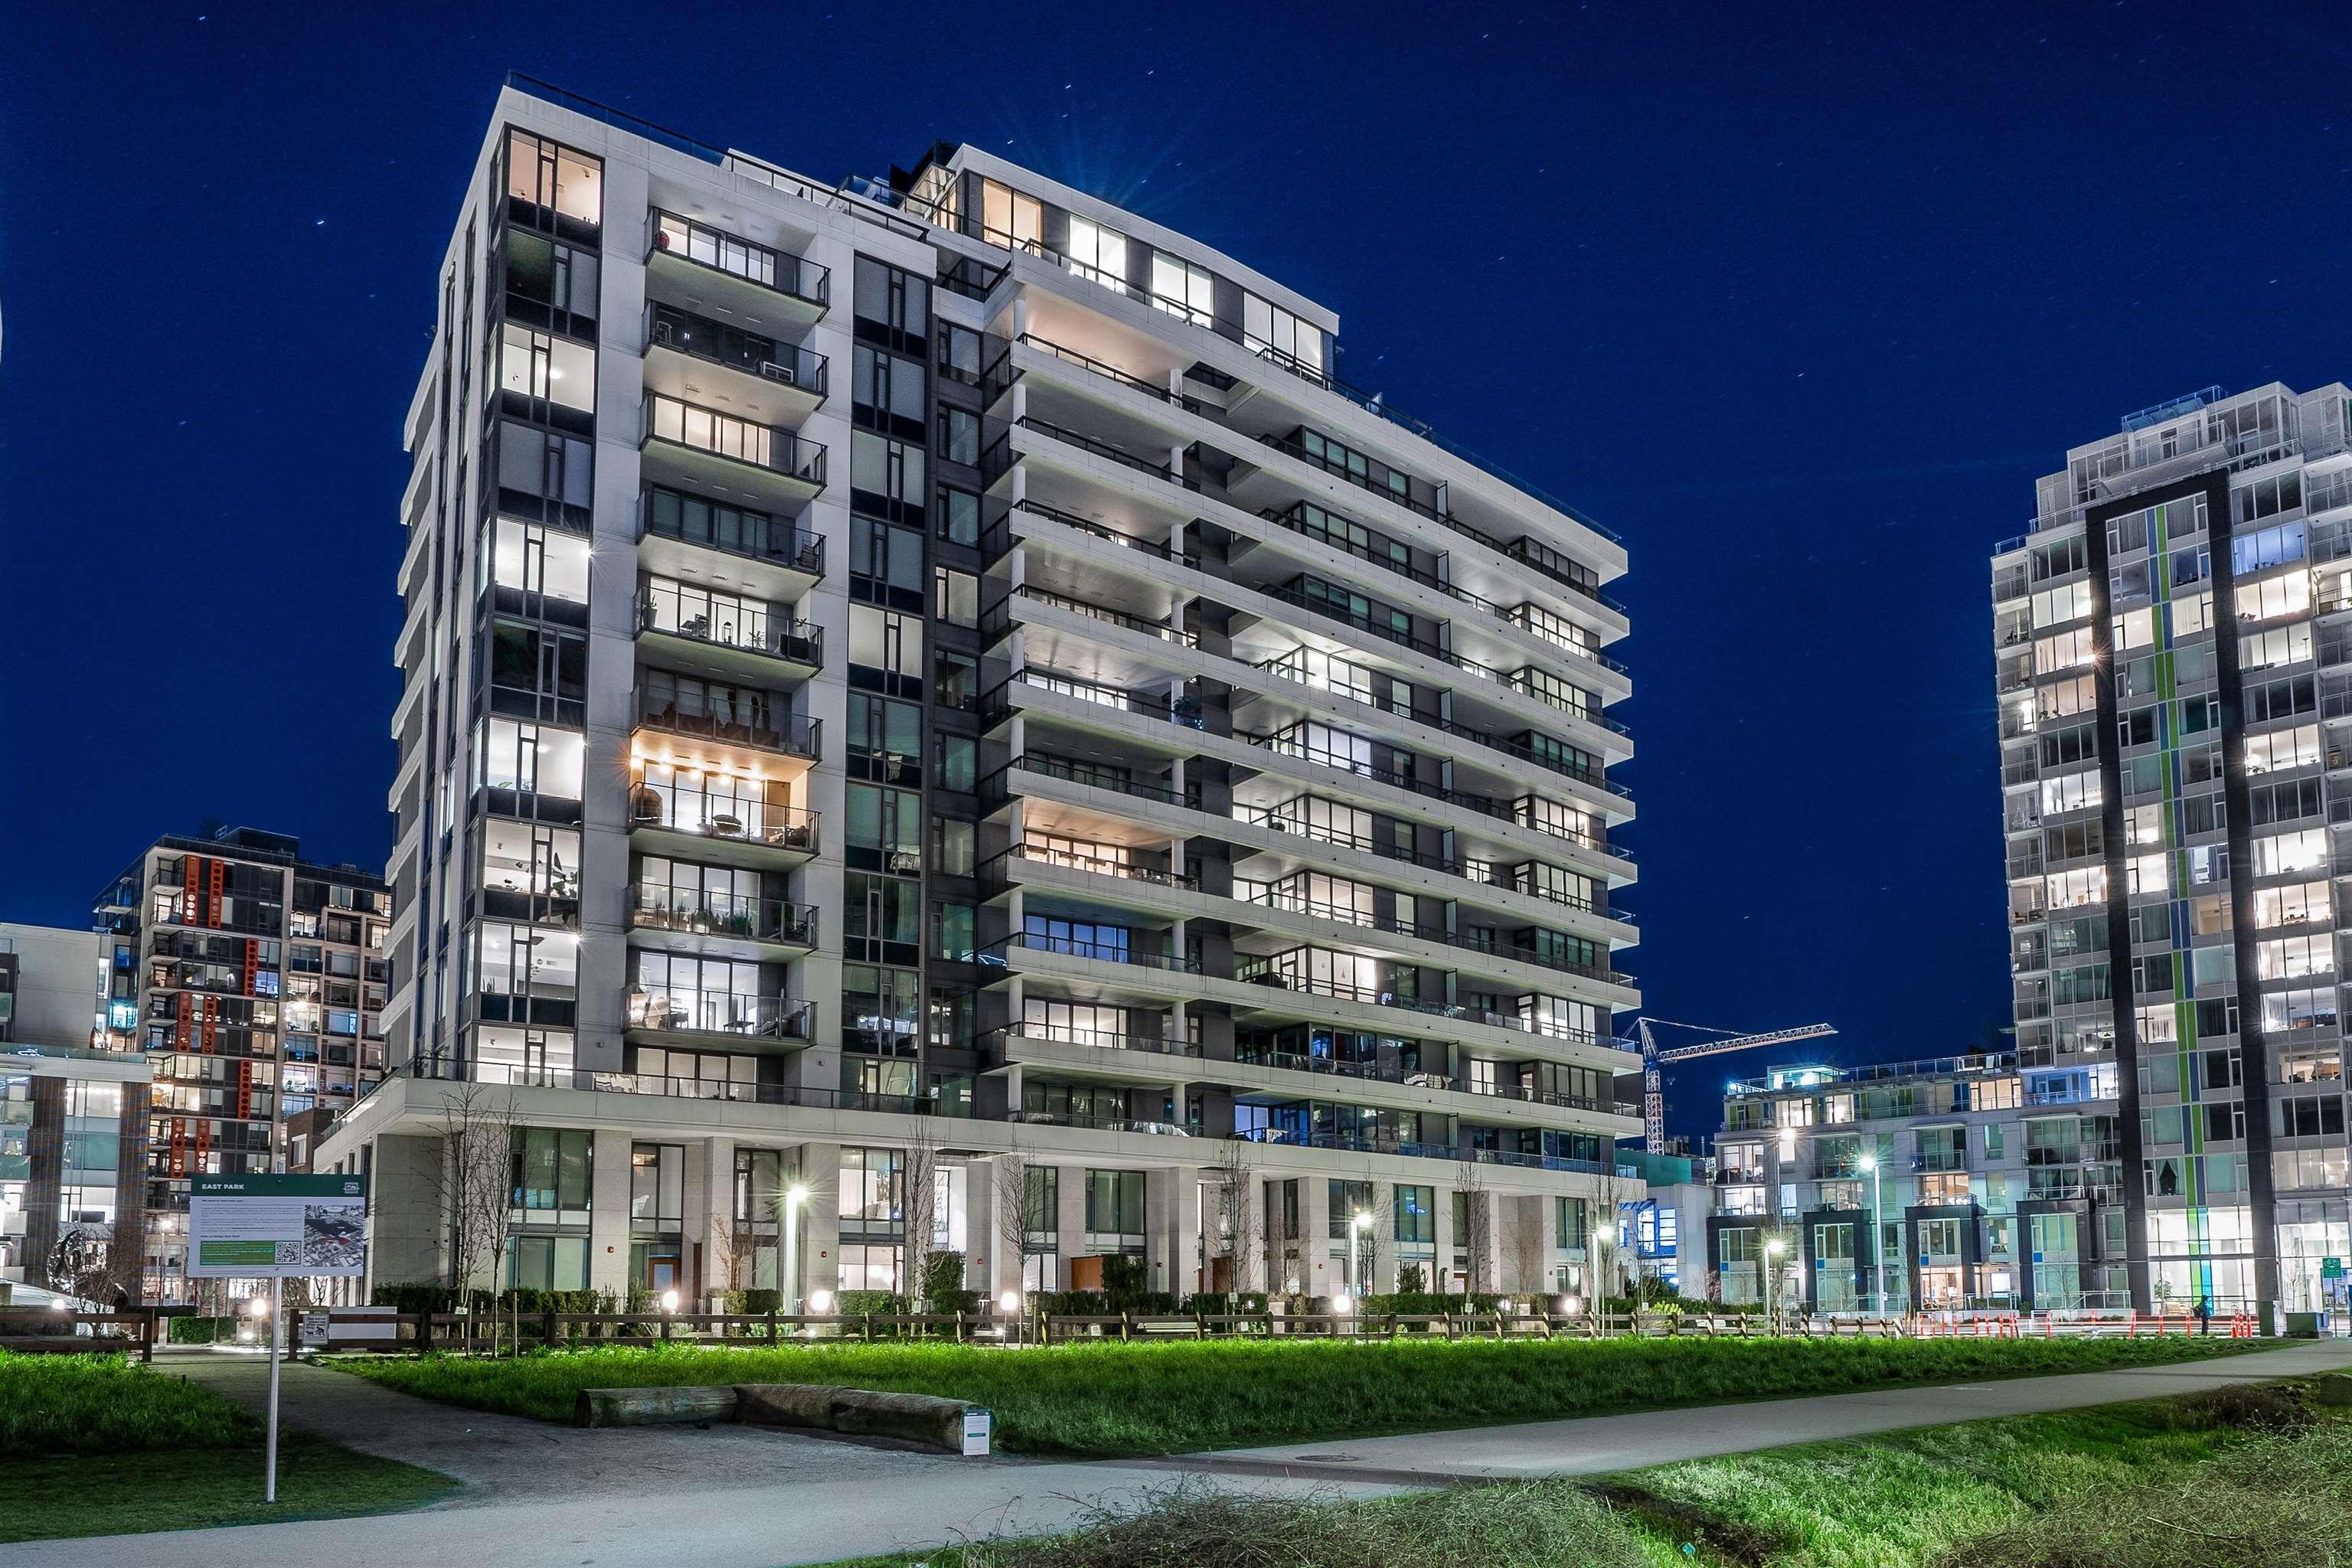 603 1688 PULLMAN PORTER STREET - Mount Pleasant VE Apartment/Condo for sale, 1 Bedroom (R2629012) - #1